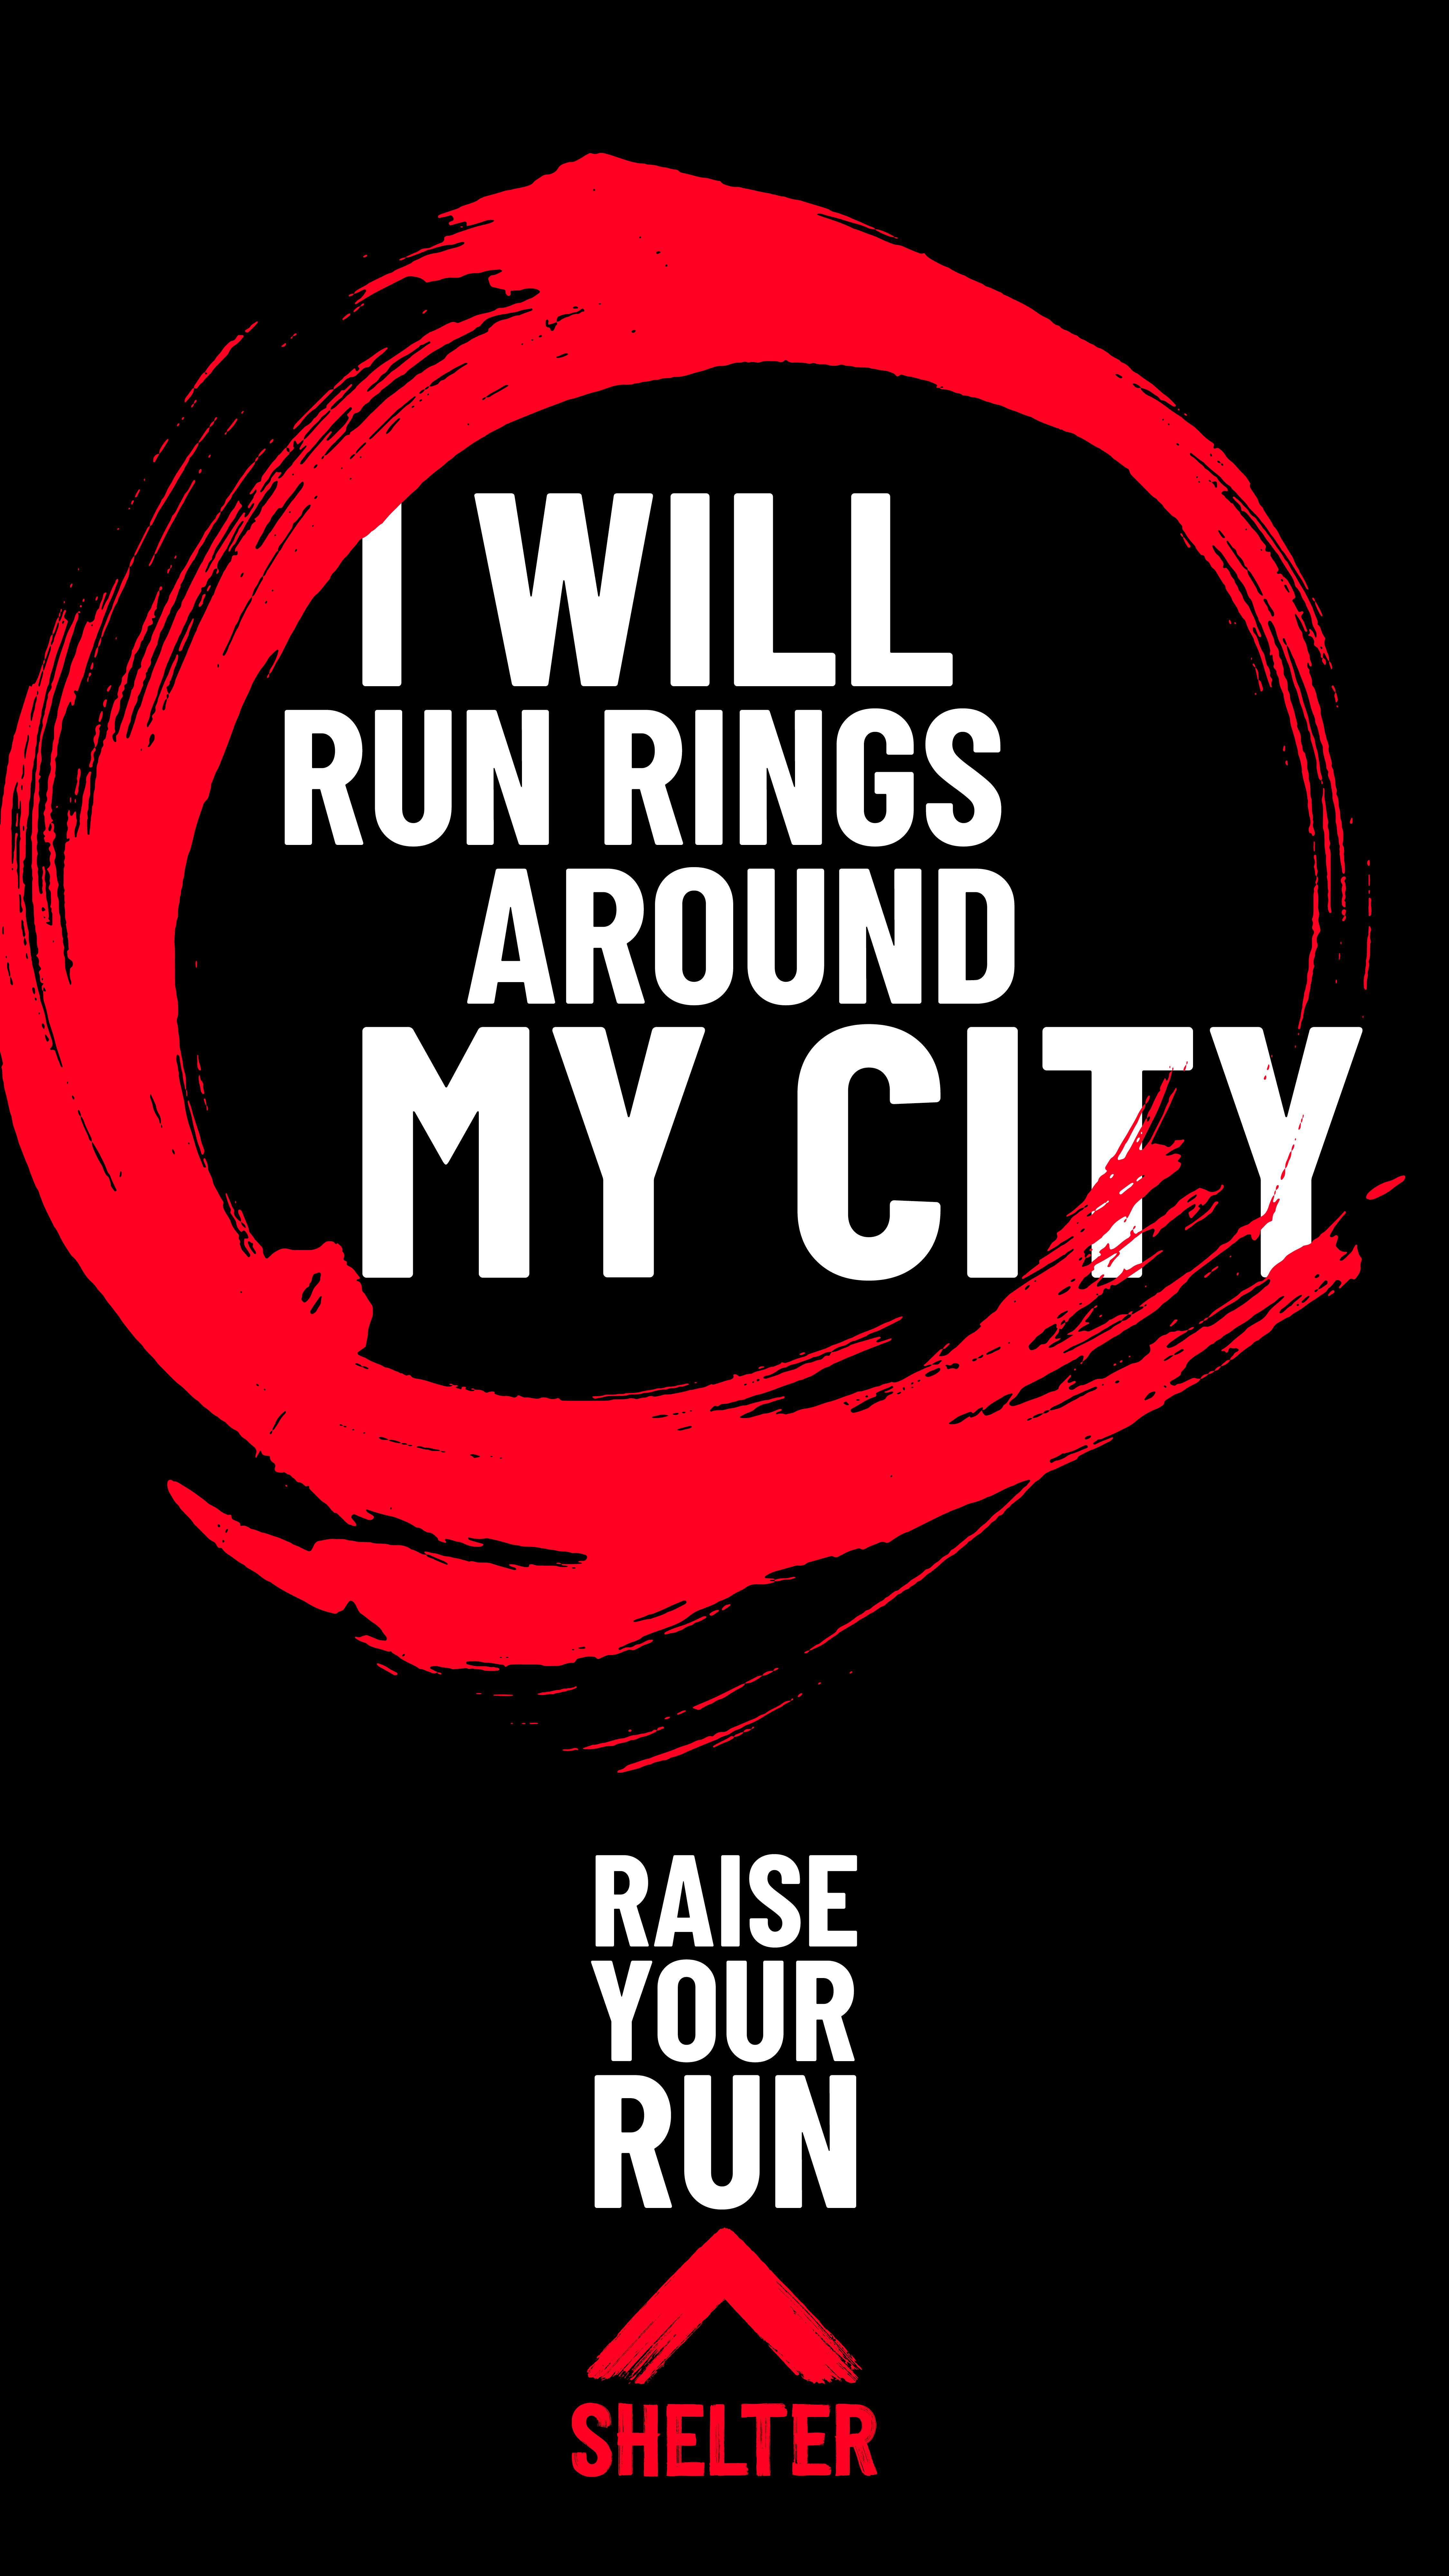 'I will run rings around my city' words on black background